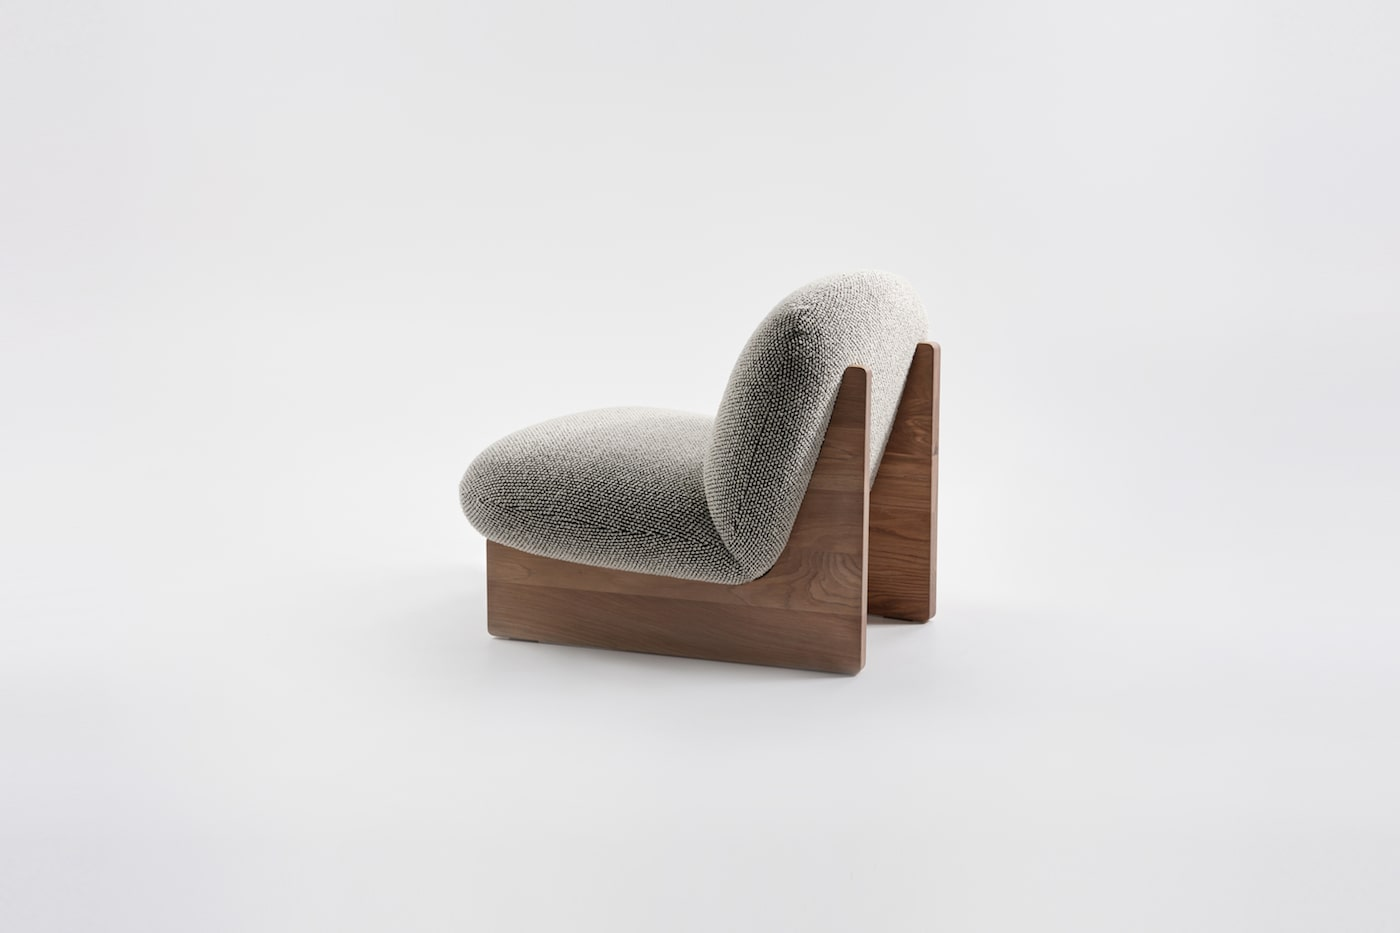 Jardan Ziggy armchair using sustainable timber